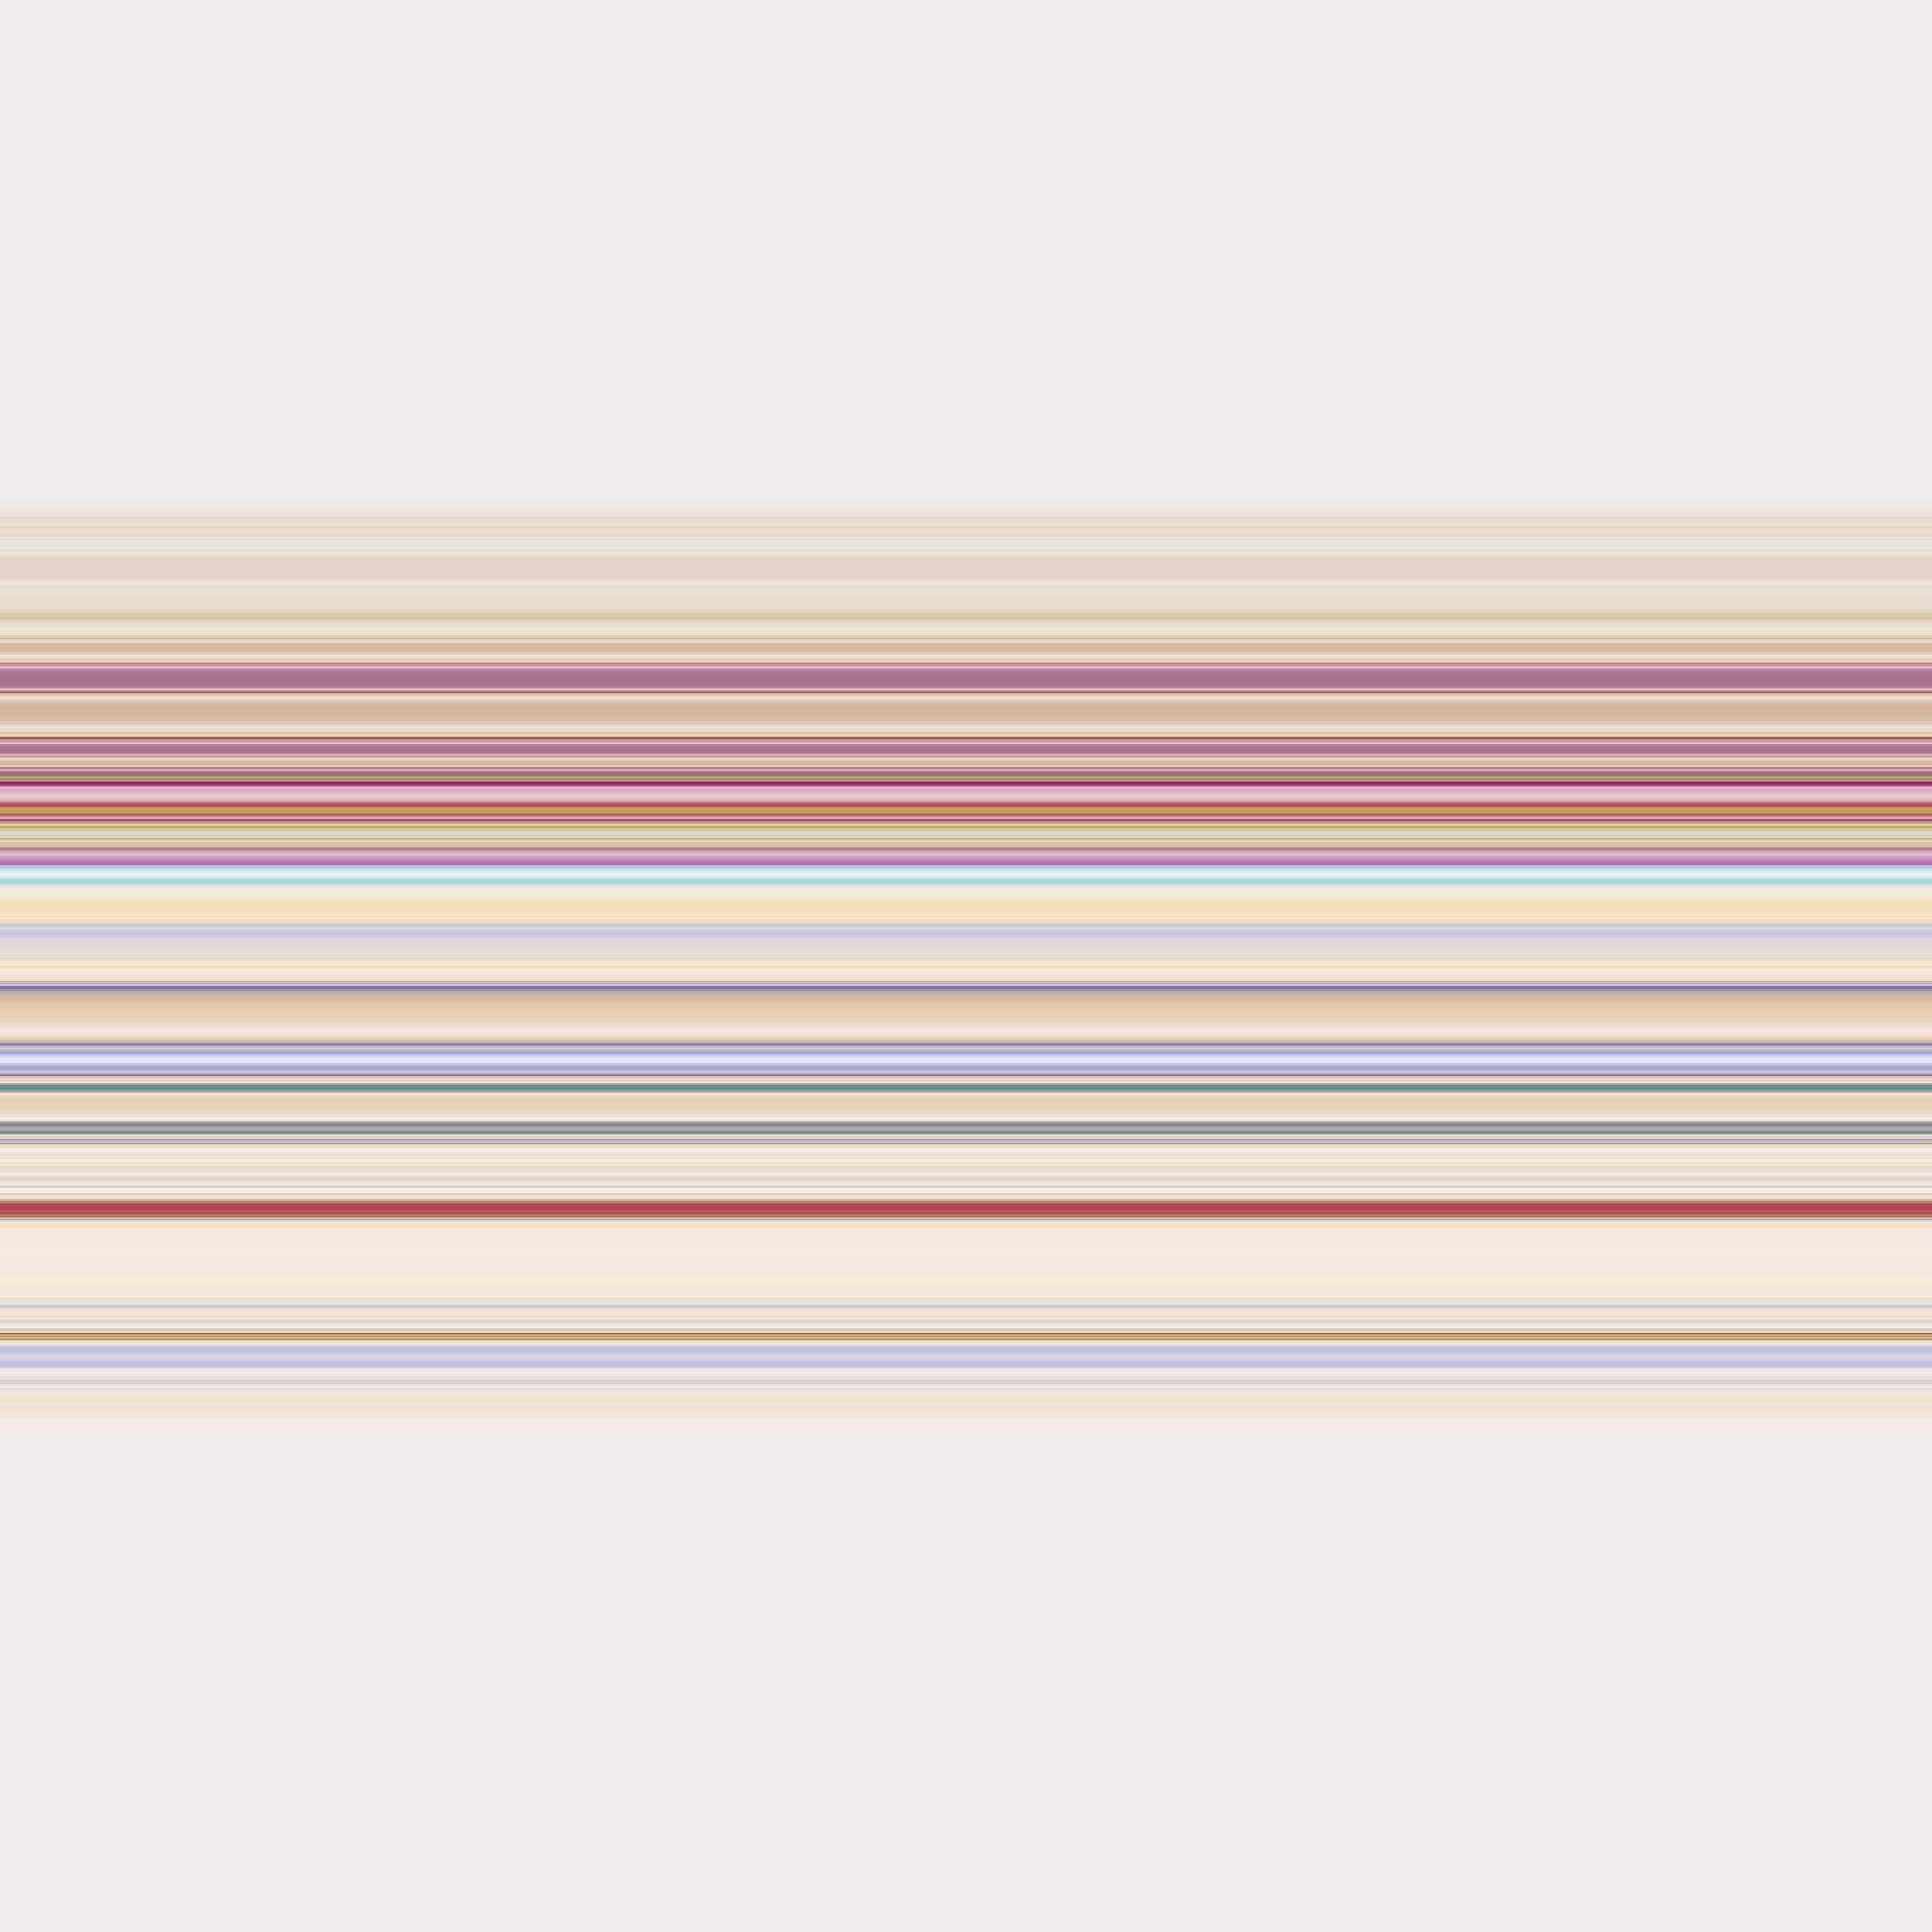 PAUL SNELL  Mute # 201706  2018 Lambda Print Face-mounted to 3mm plexiglas 100 ×100 cm